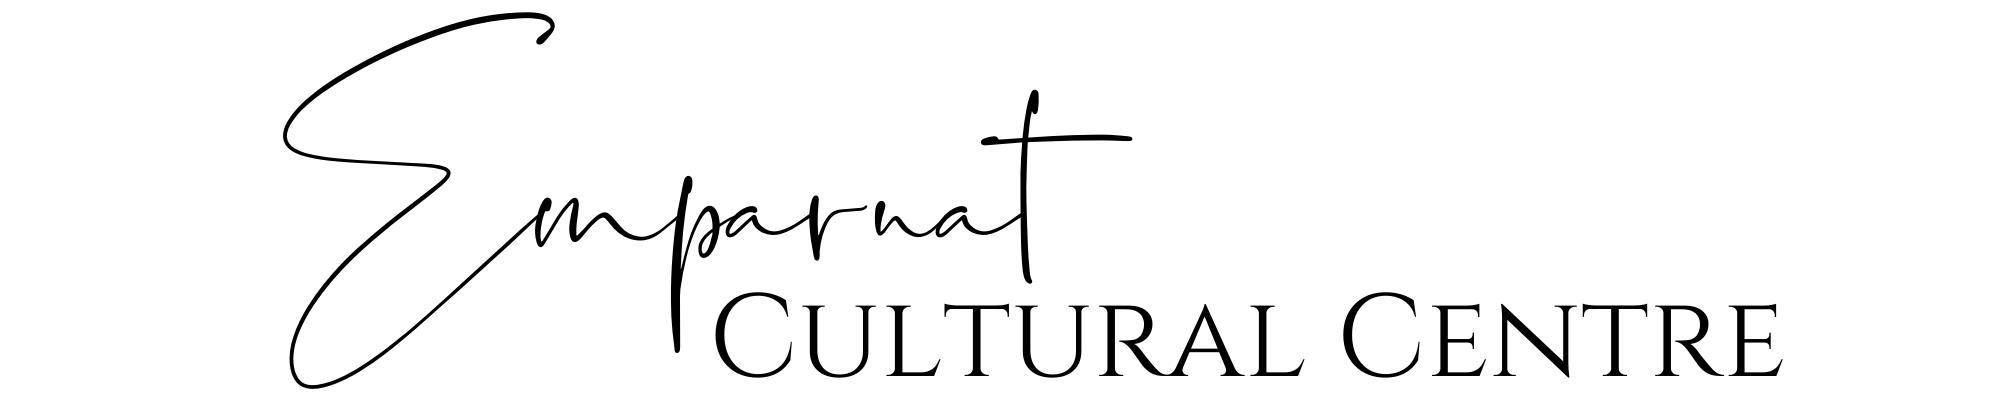 Emparnat Cultural Centre